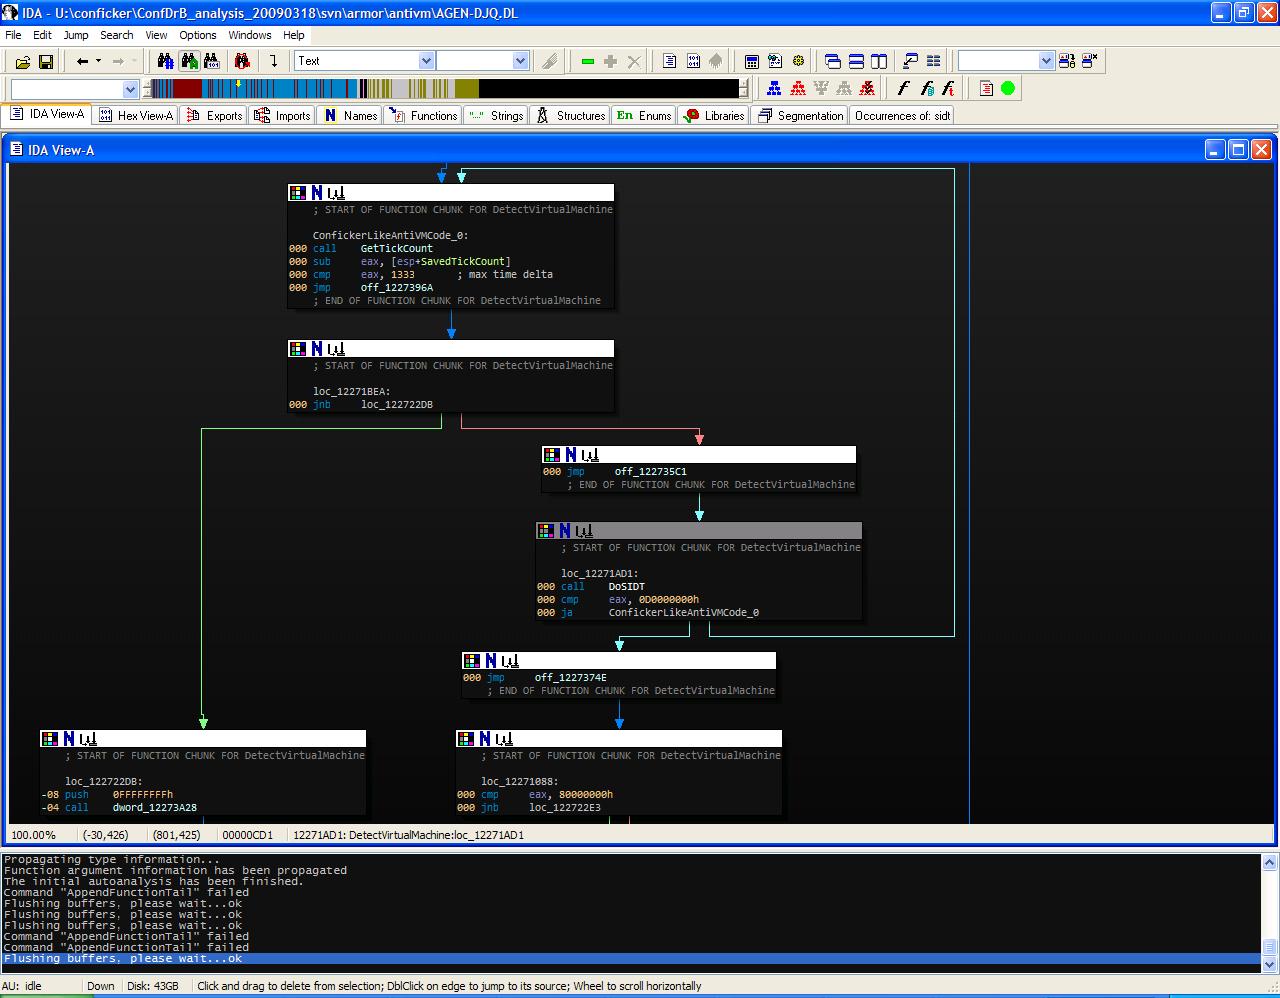 Troj/Agent-DJQ SIDT detection loop